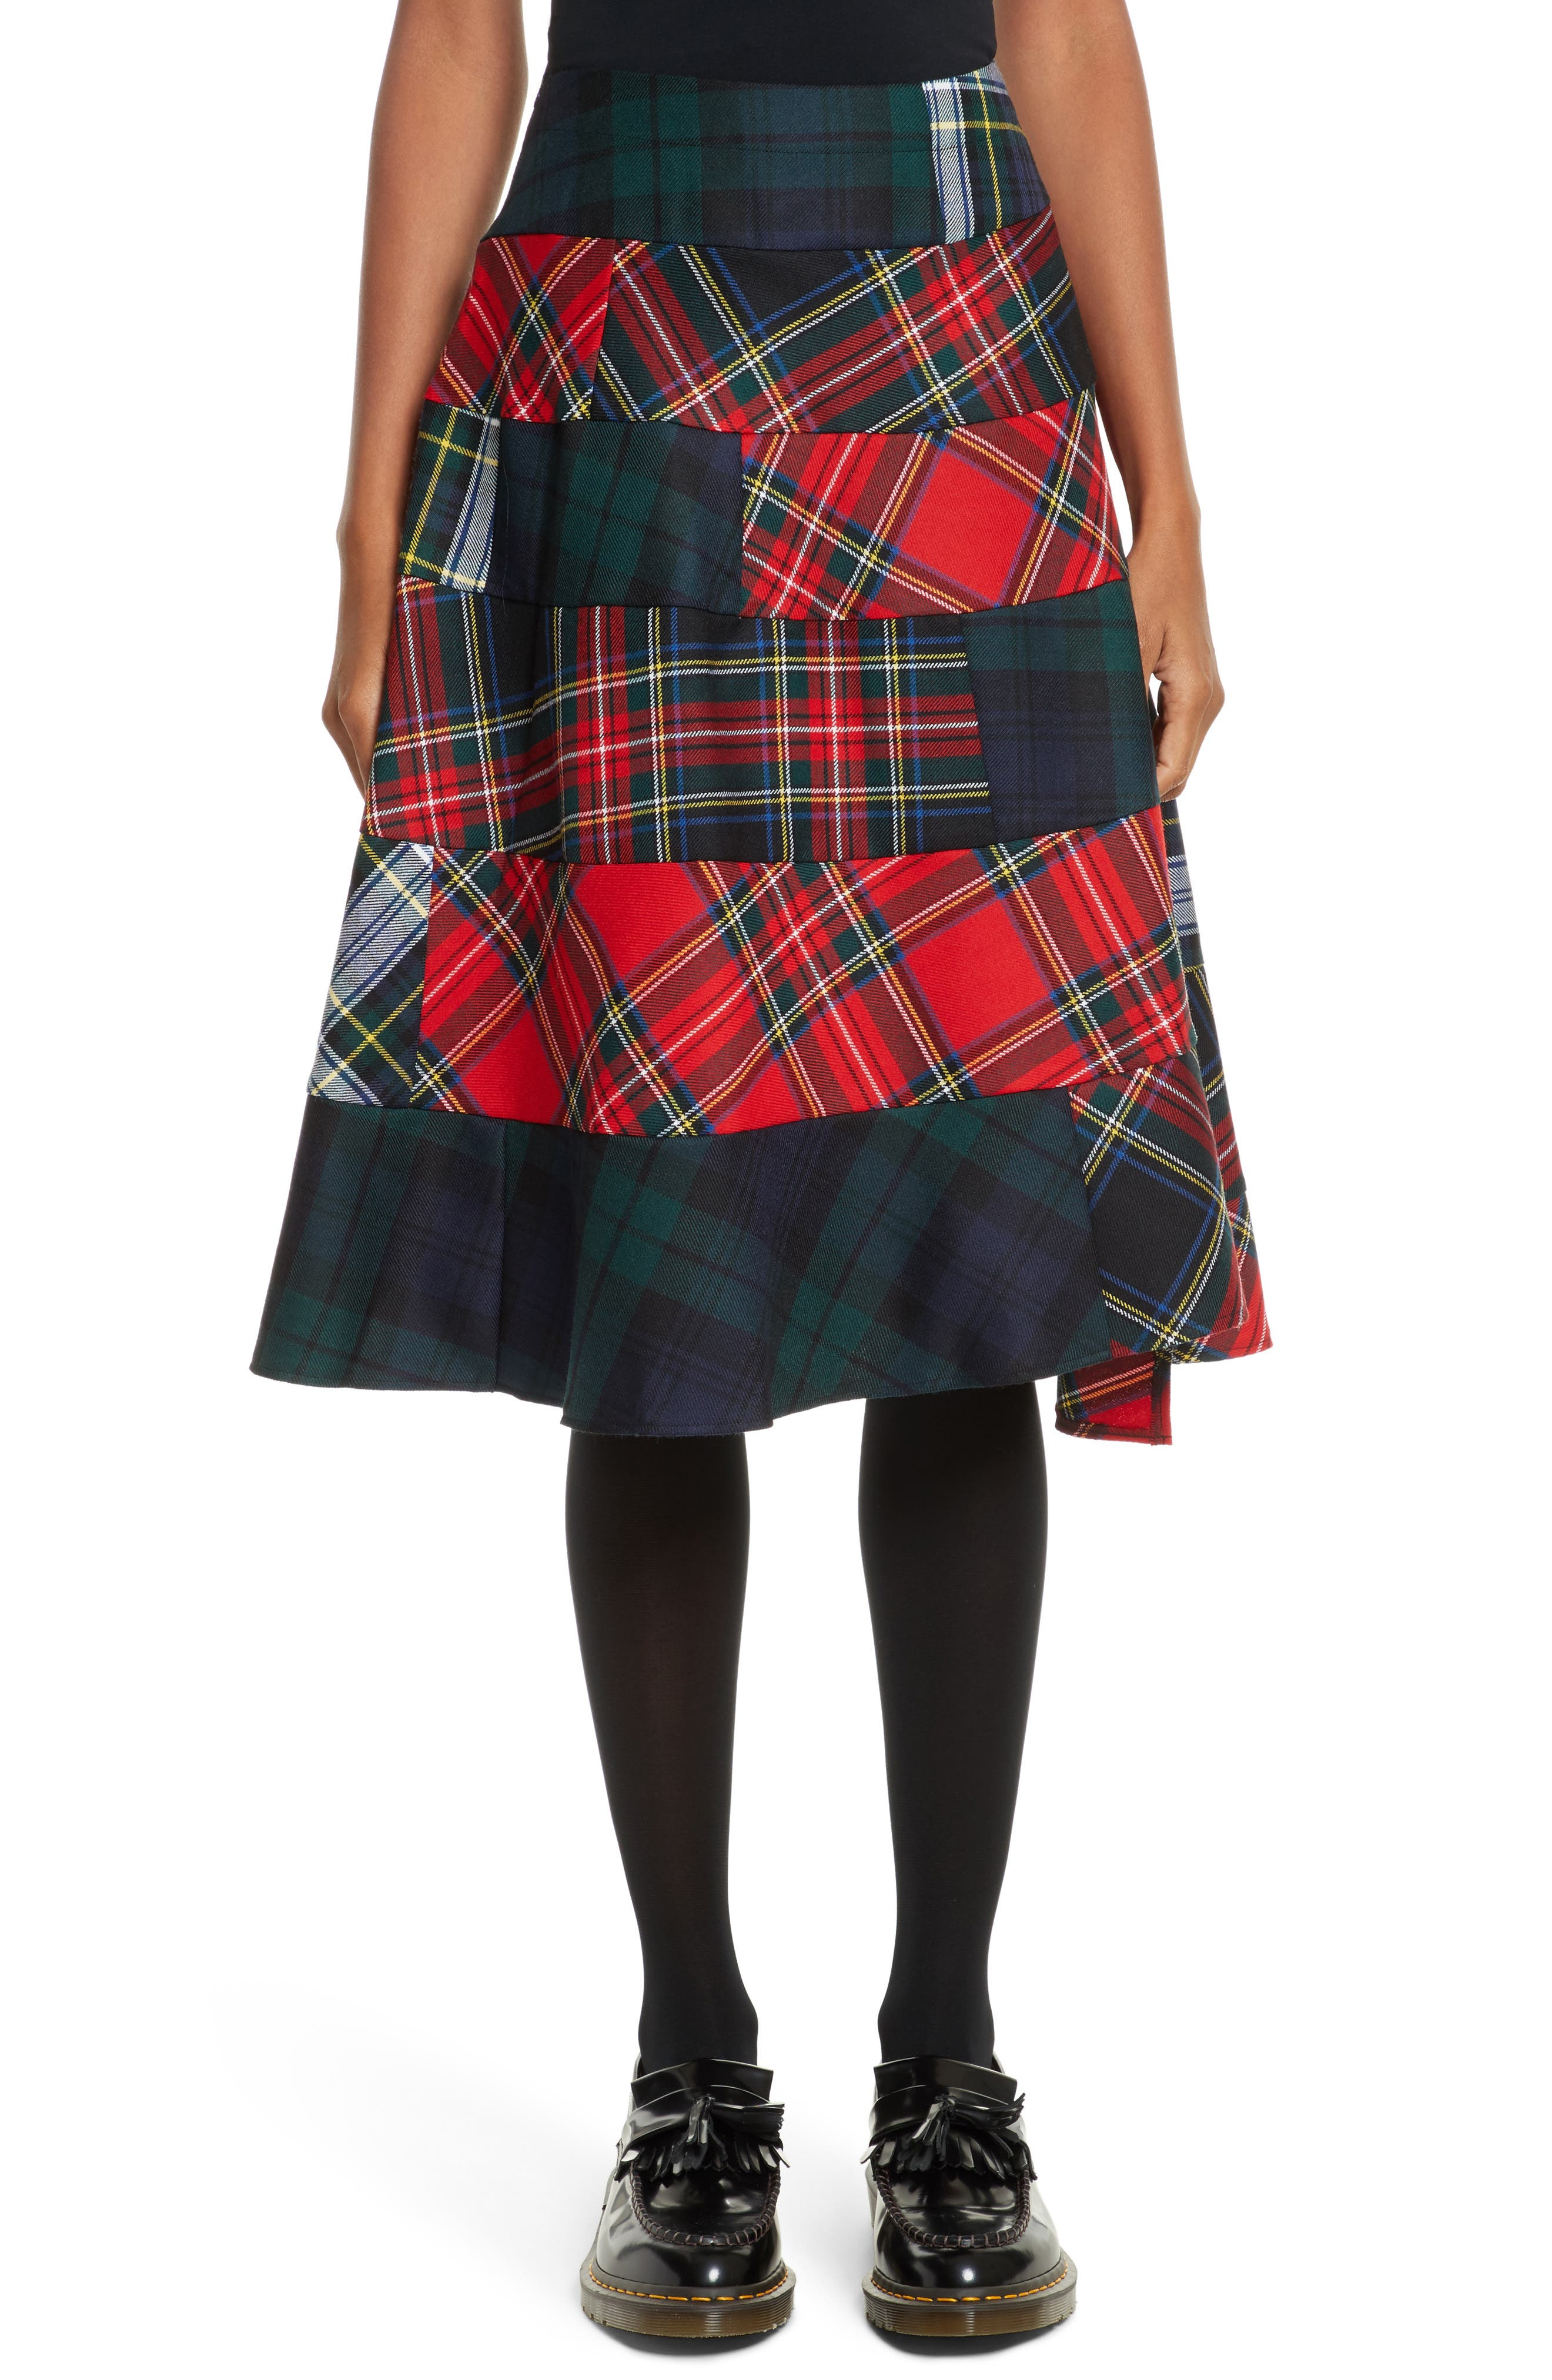 Tricot Comme des Garçons Tartan Plaid Skirt